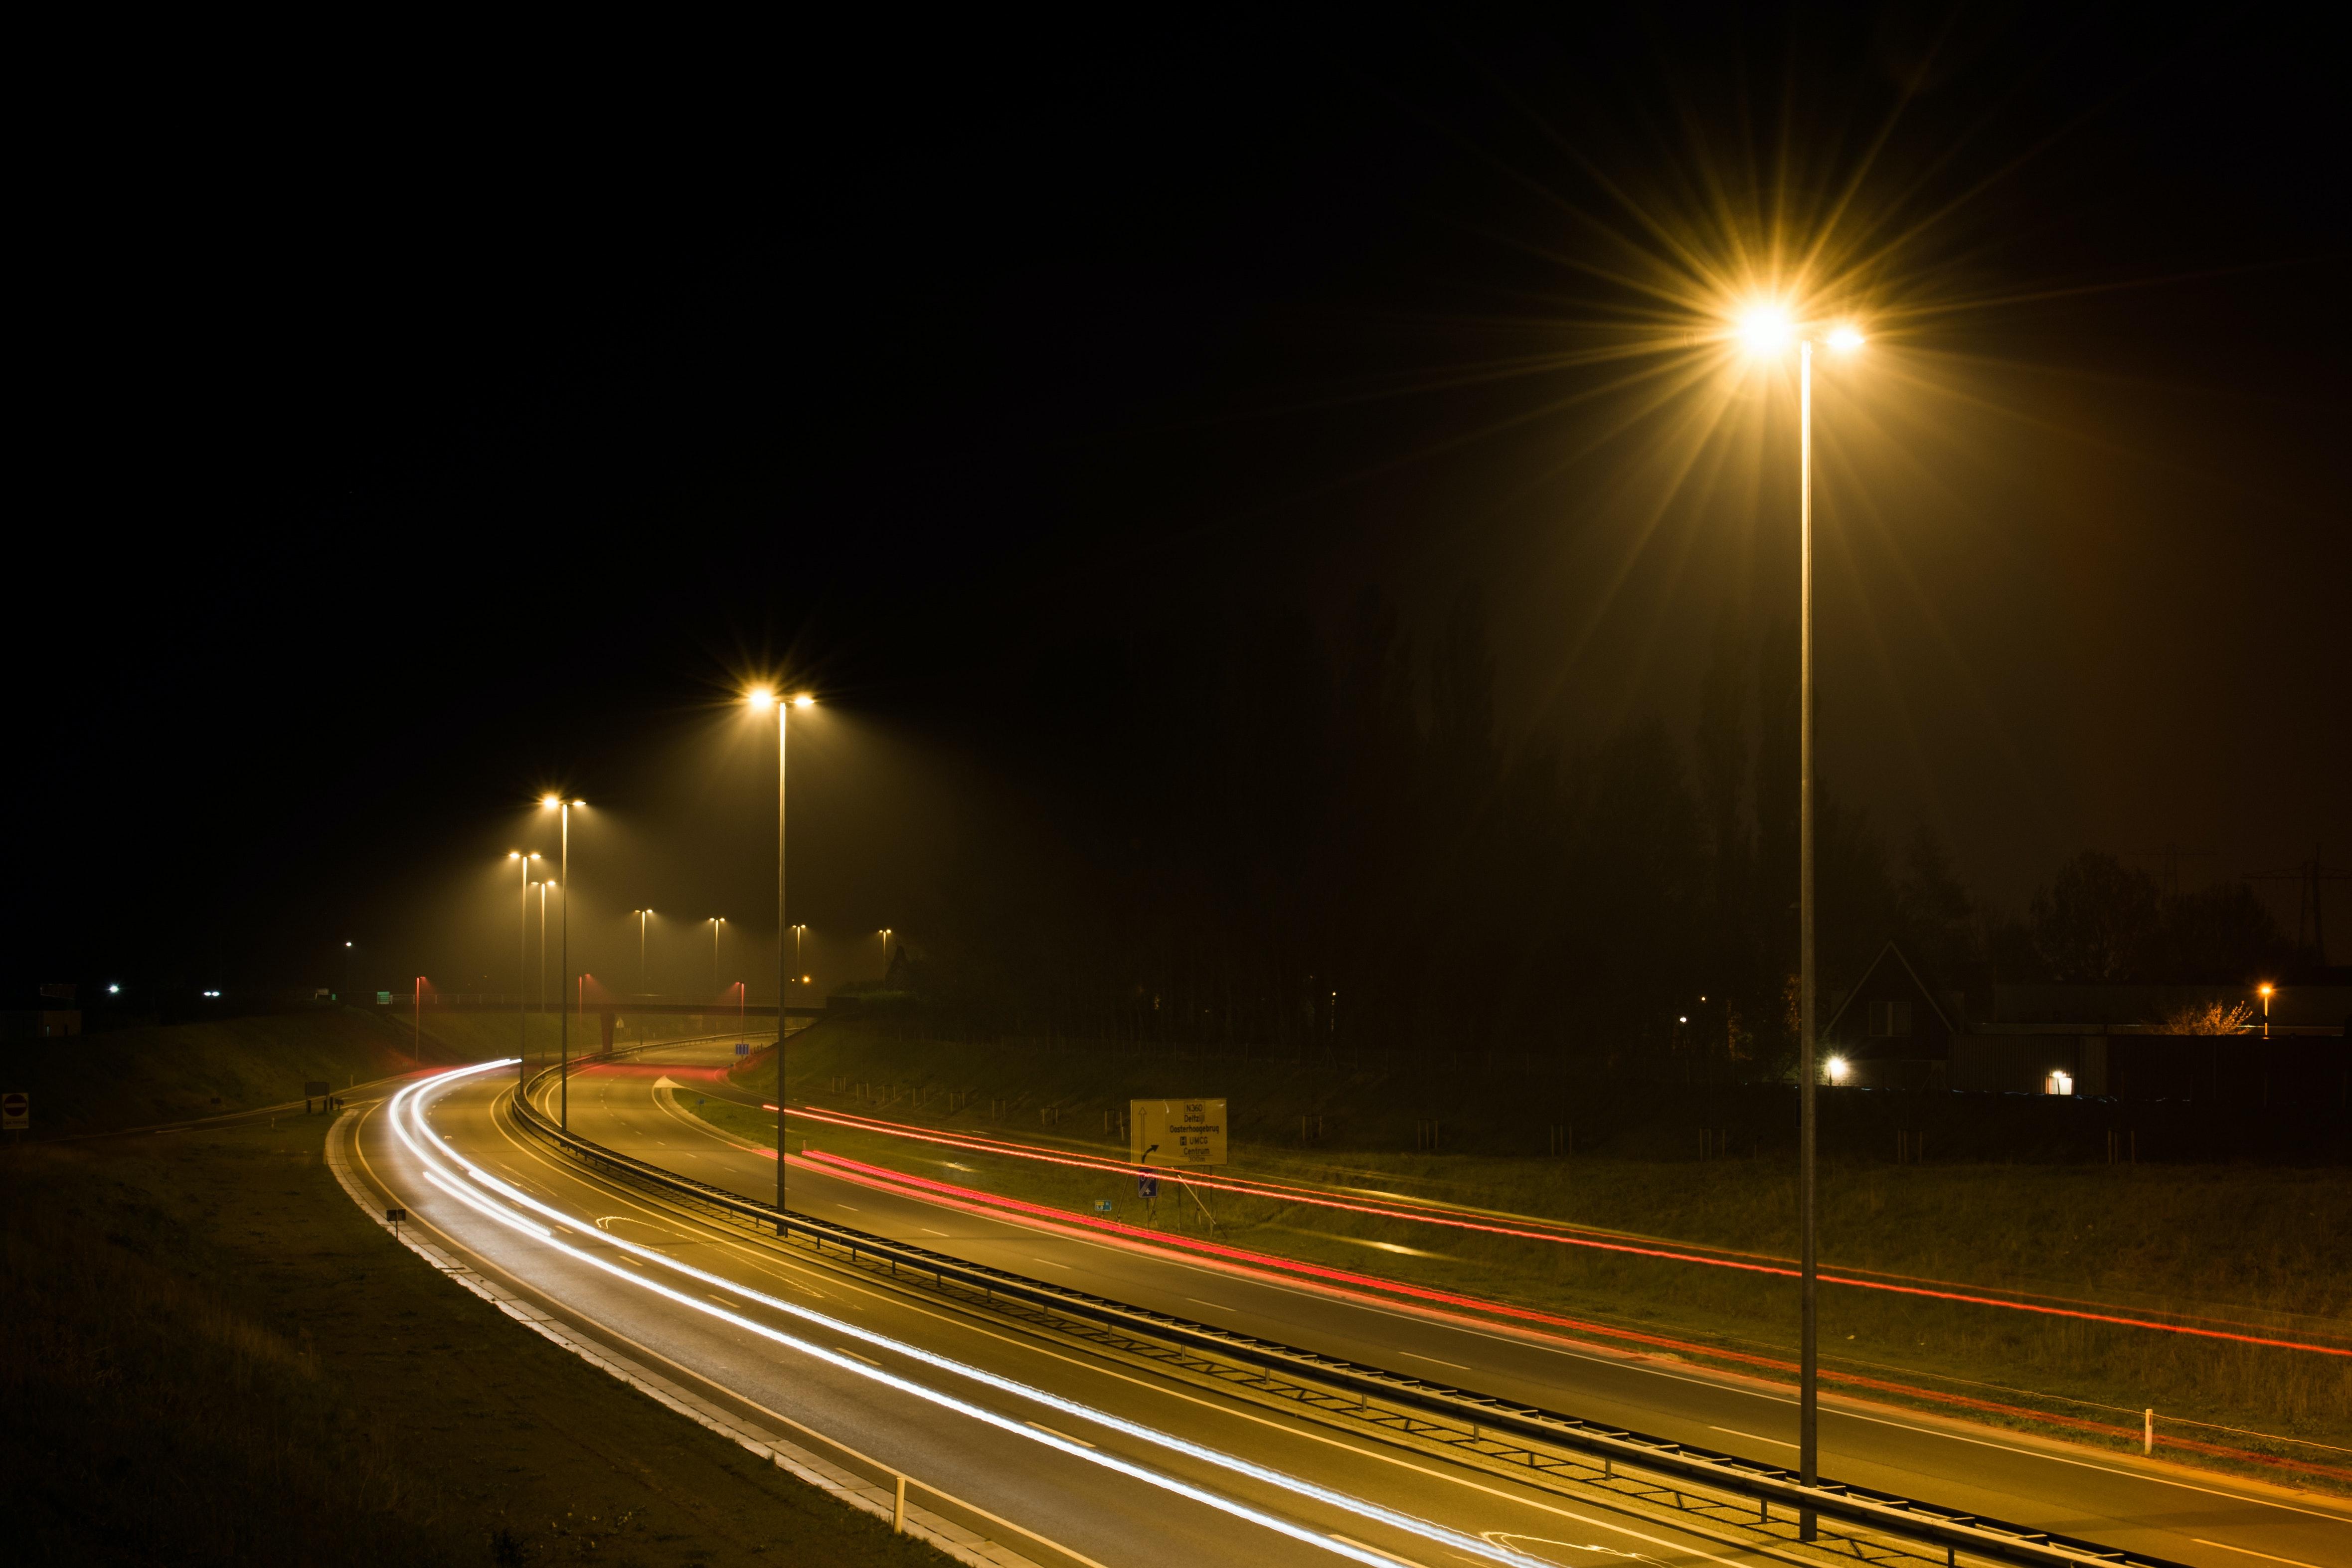 1000 Great Street Lights Photos Pexels Free Stock